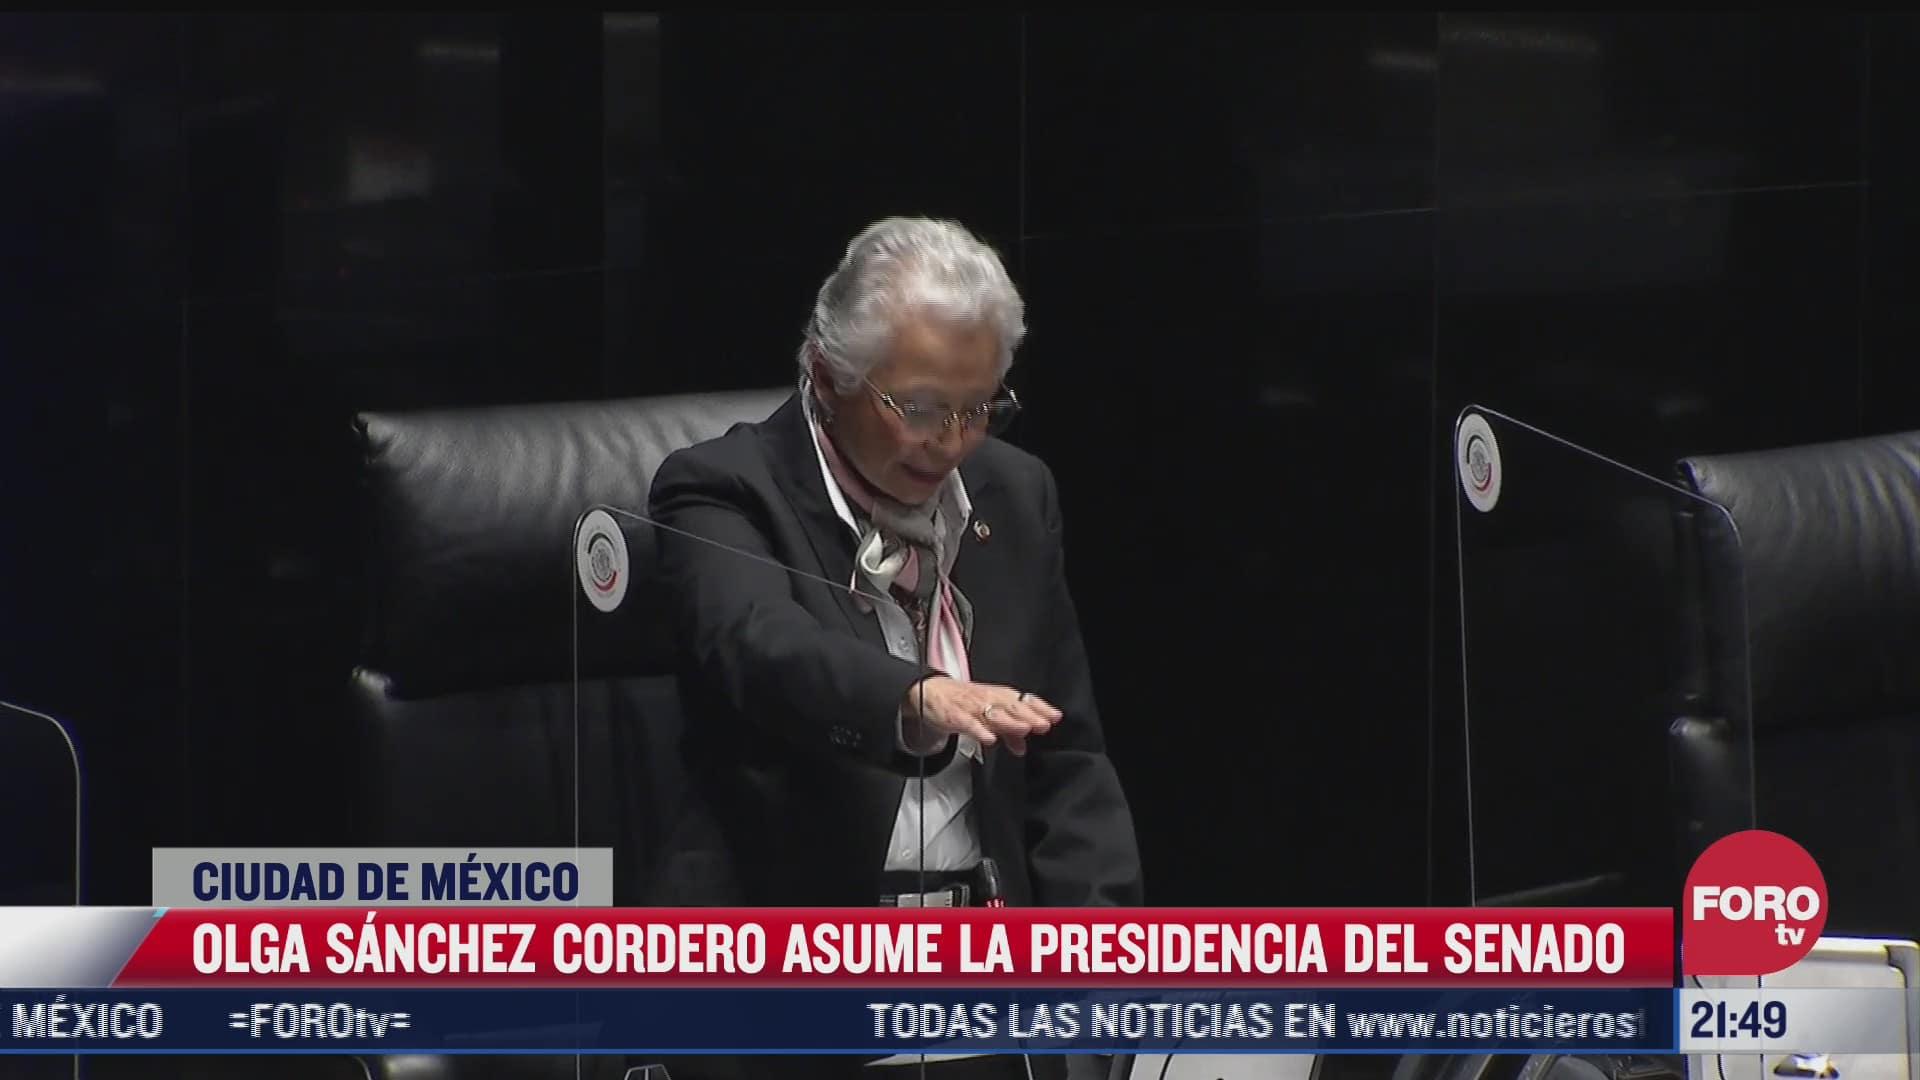 olga sanchez cordero asume la presidencia del senado